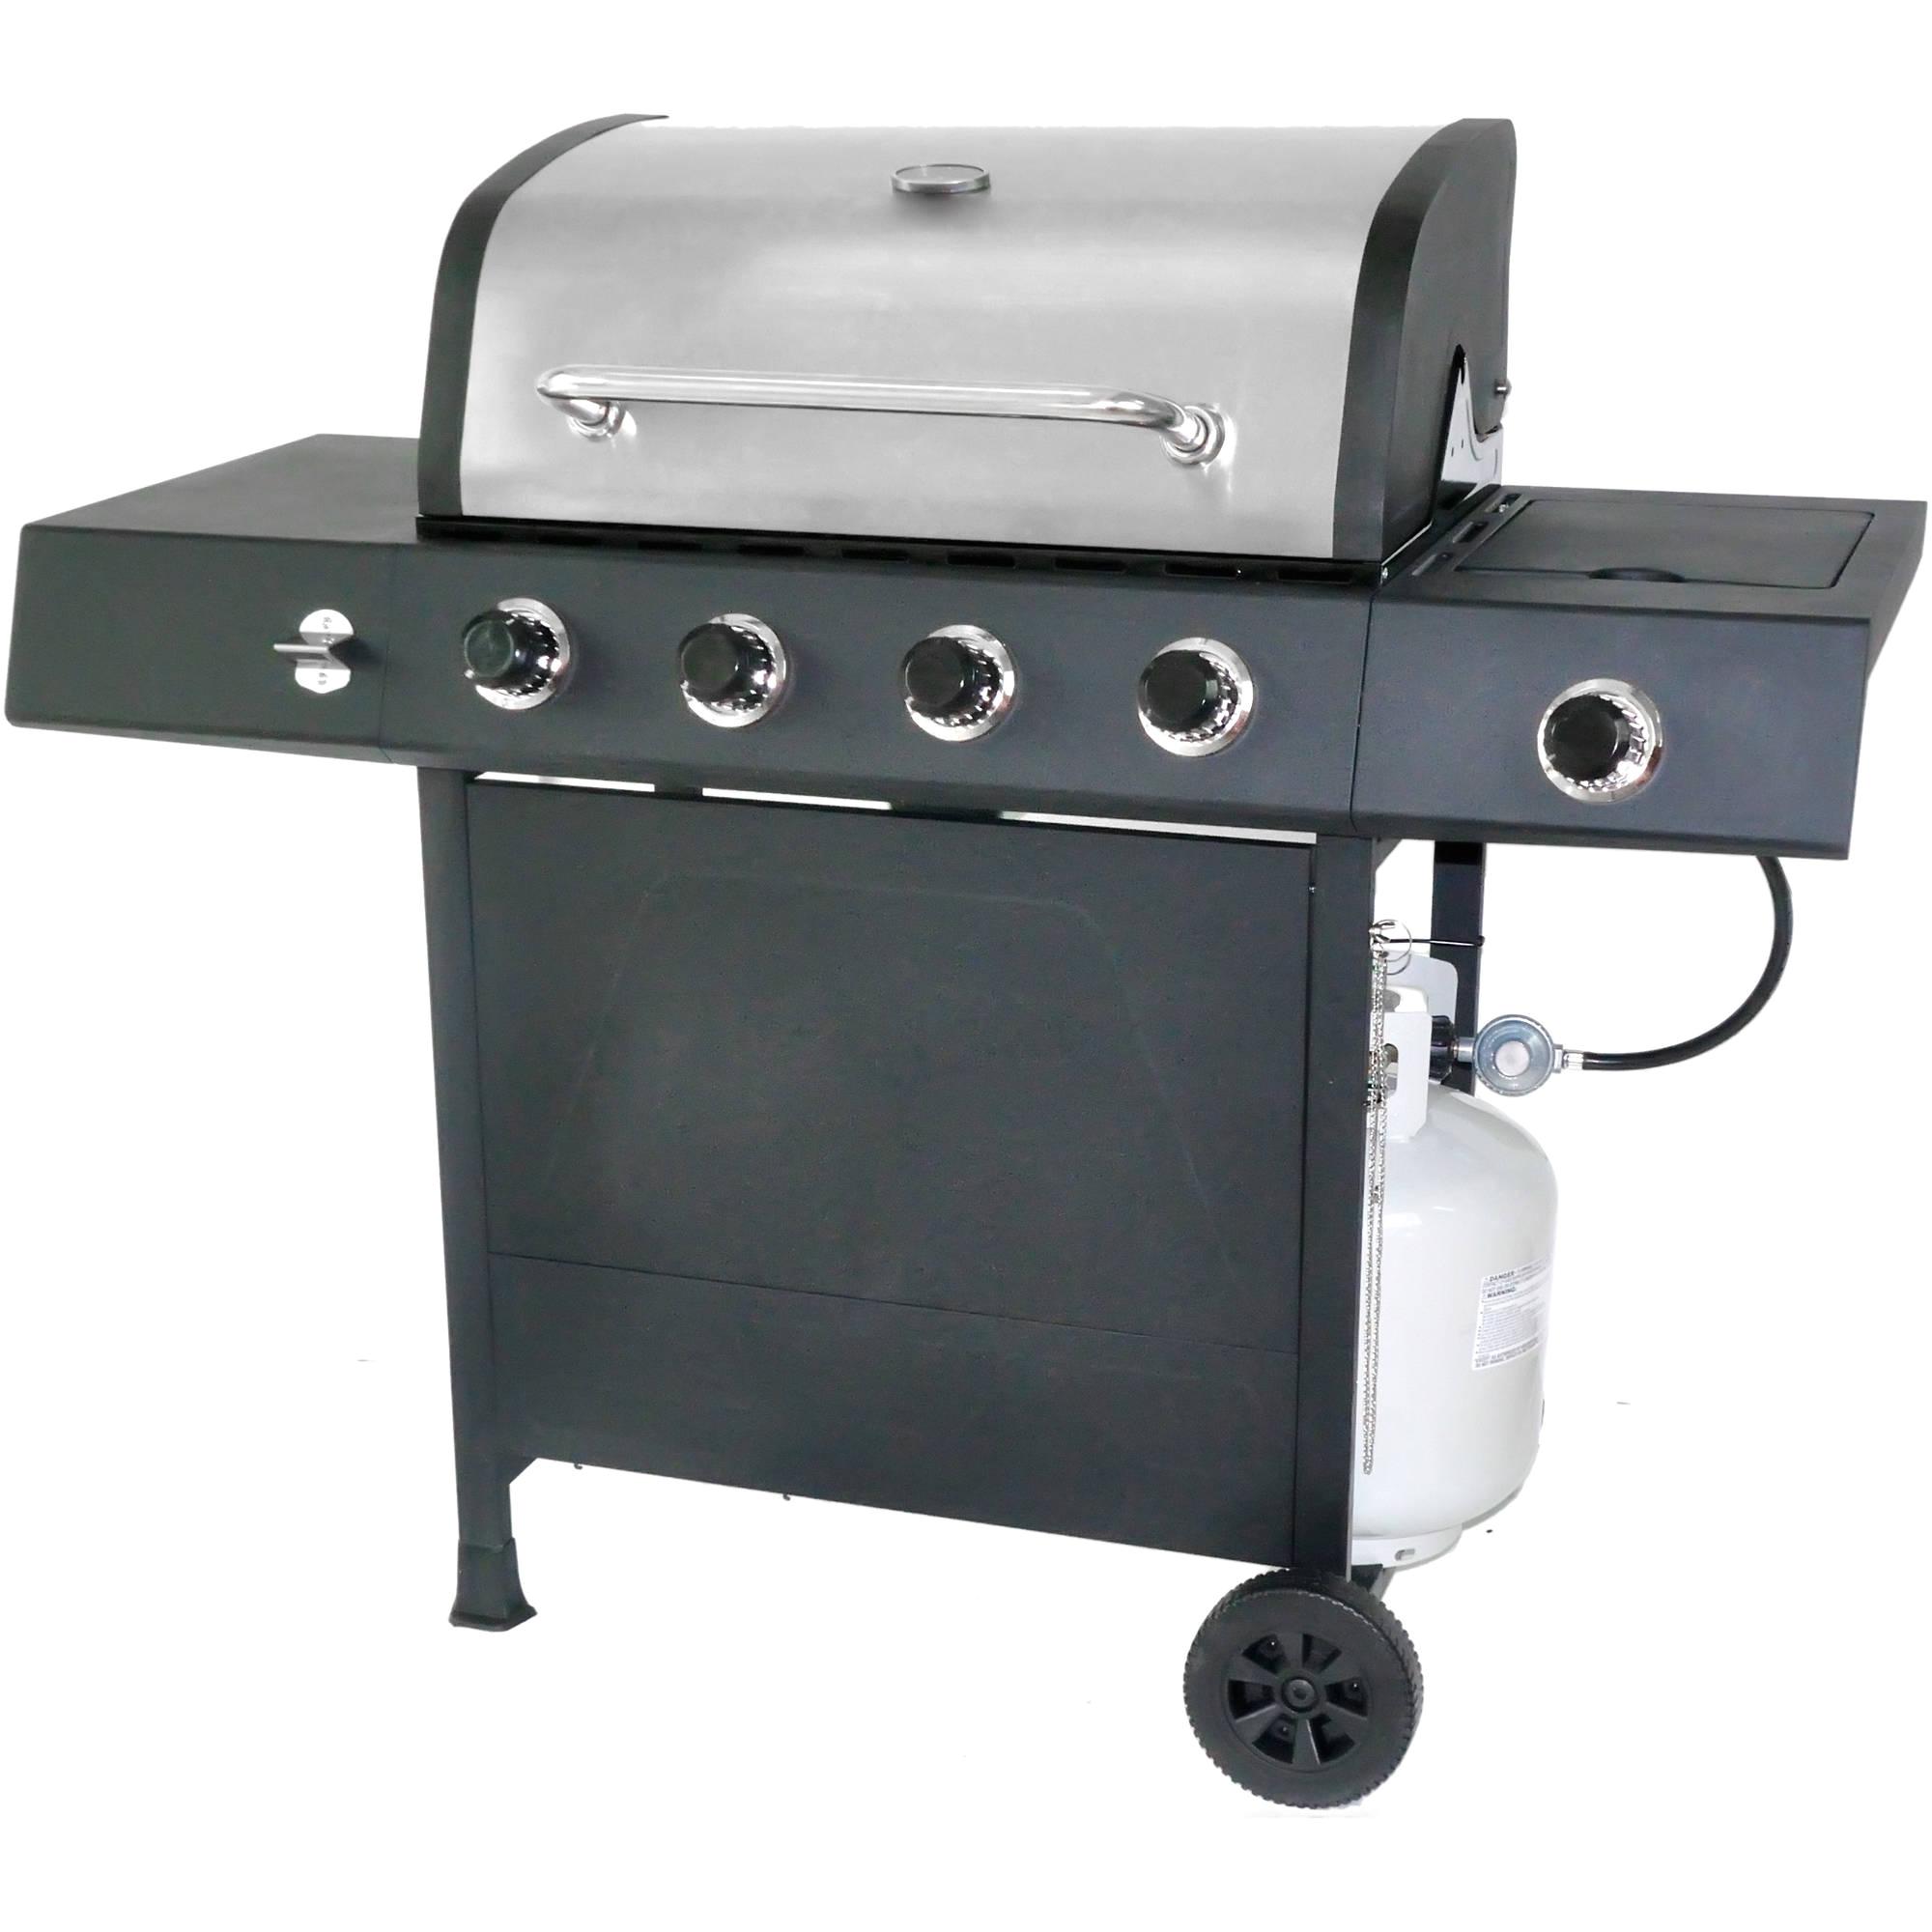 revoace 4 burner lp gas grill with side burner stainless steel walmart com